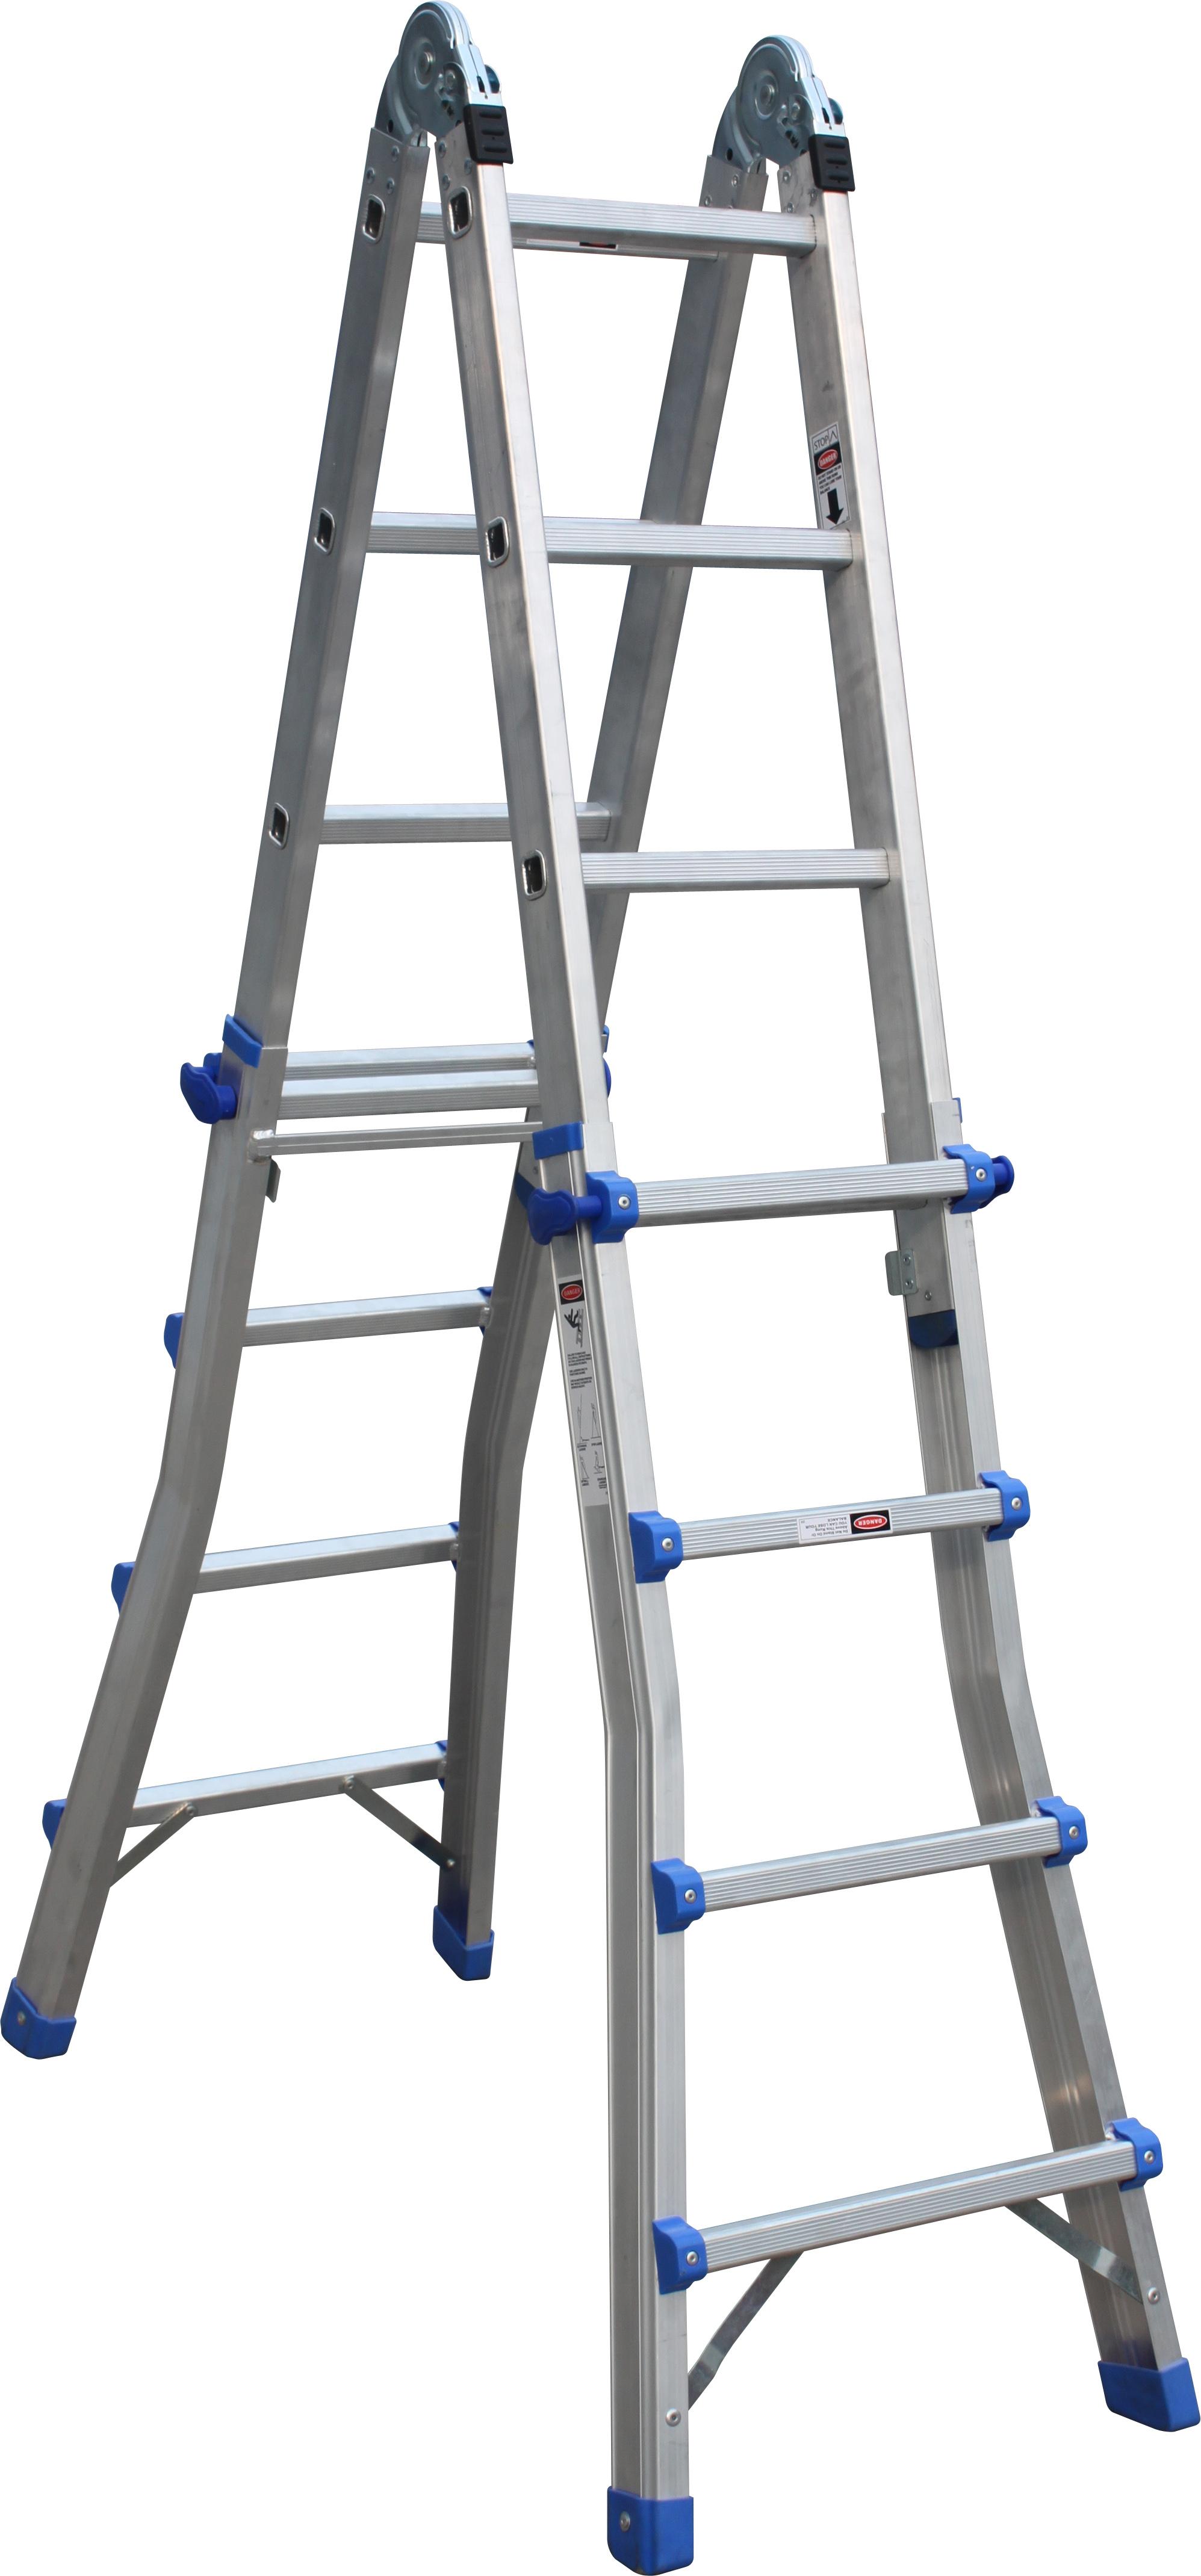 Telescoping Step Ladder : Telescopic multi combination step ladder system